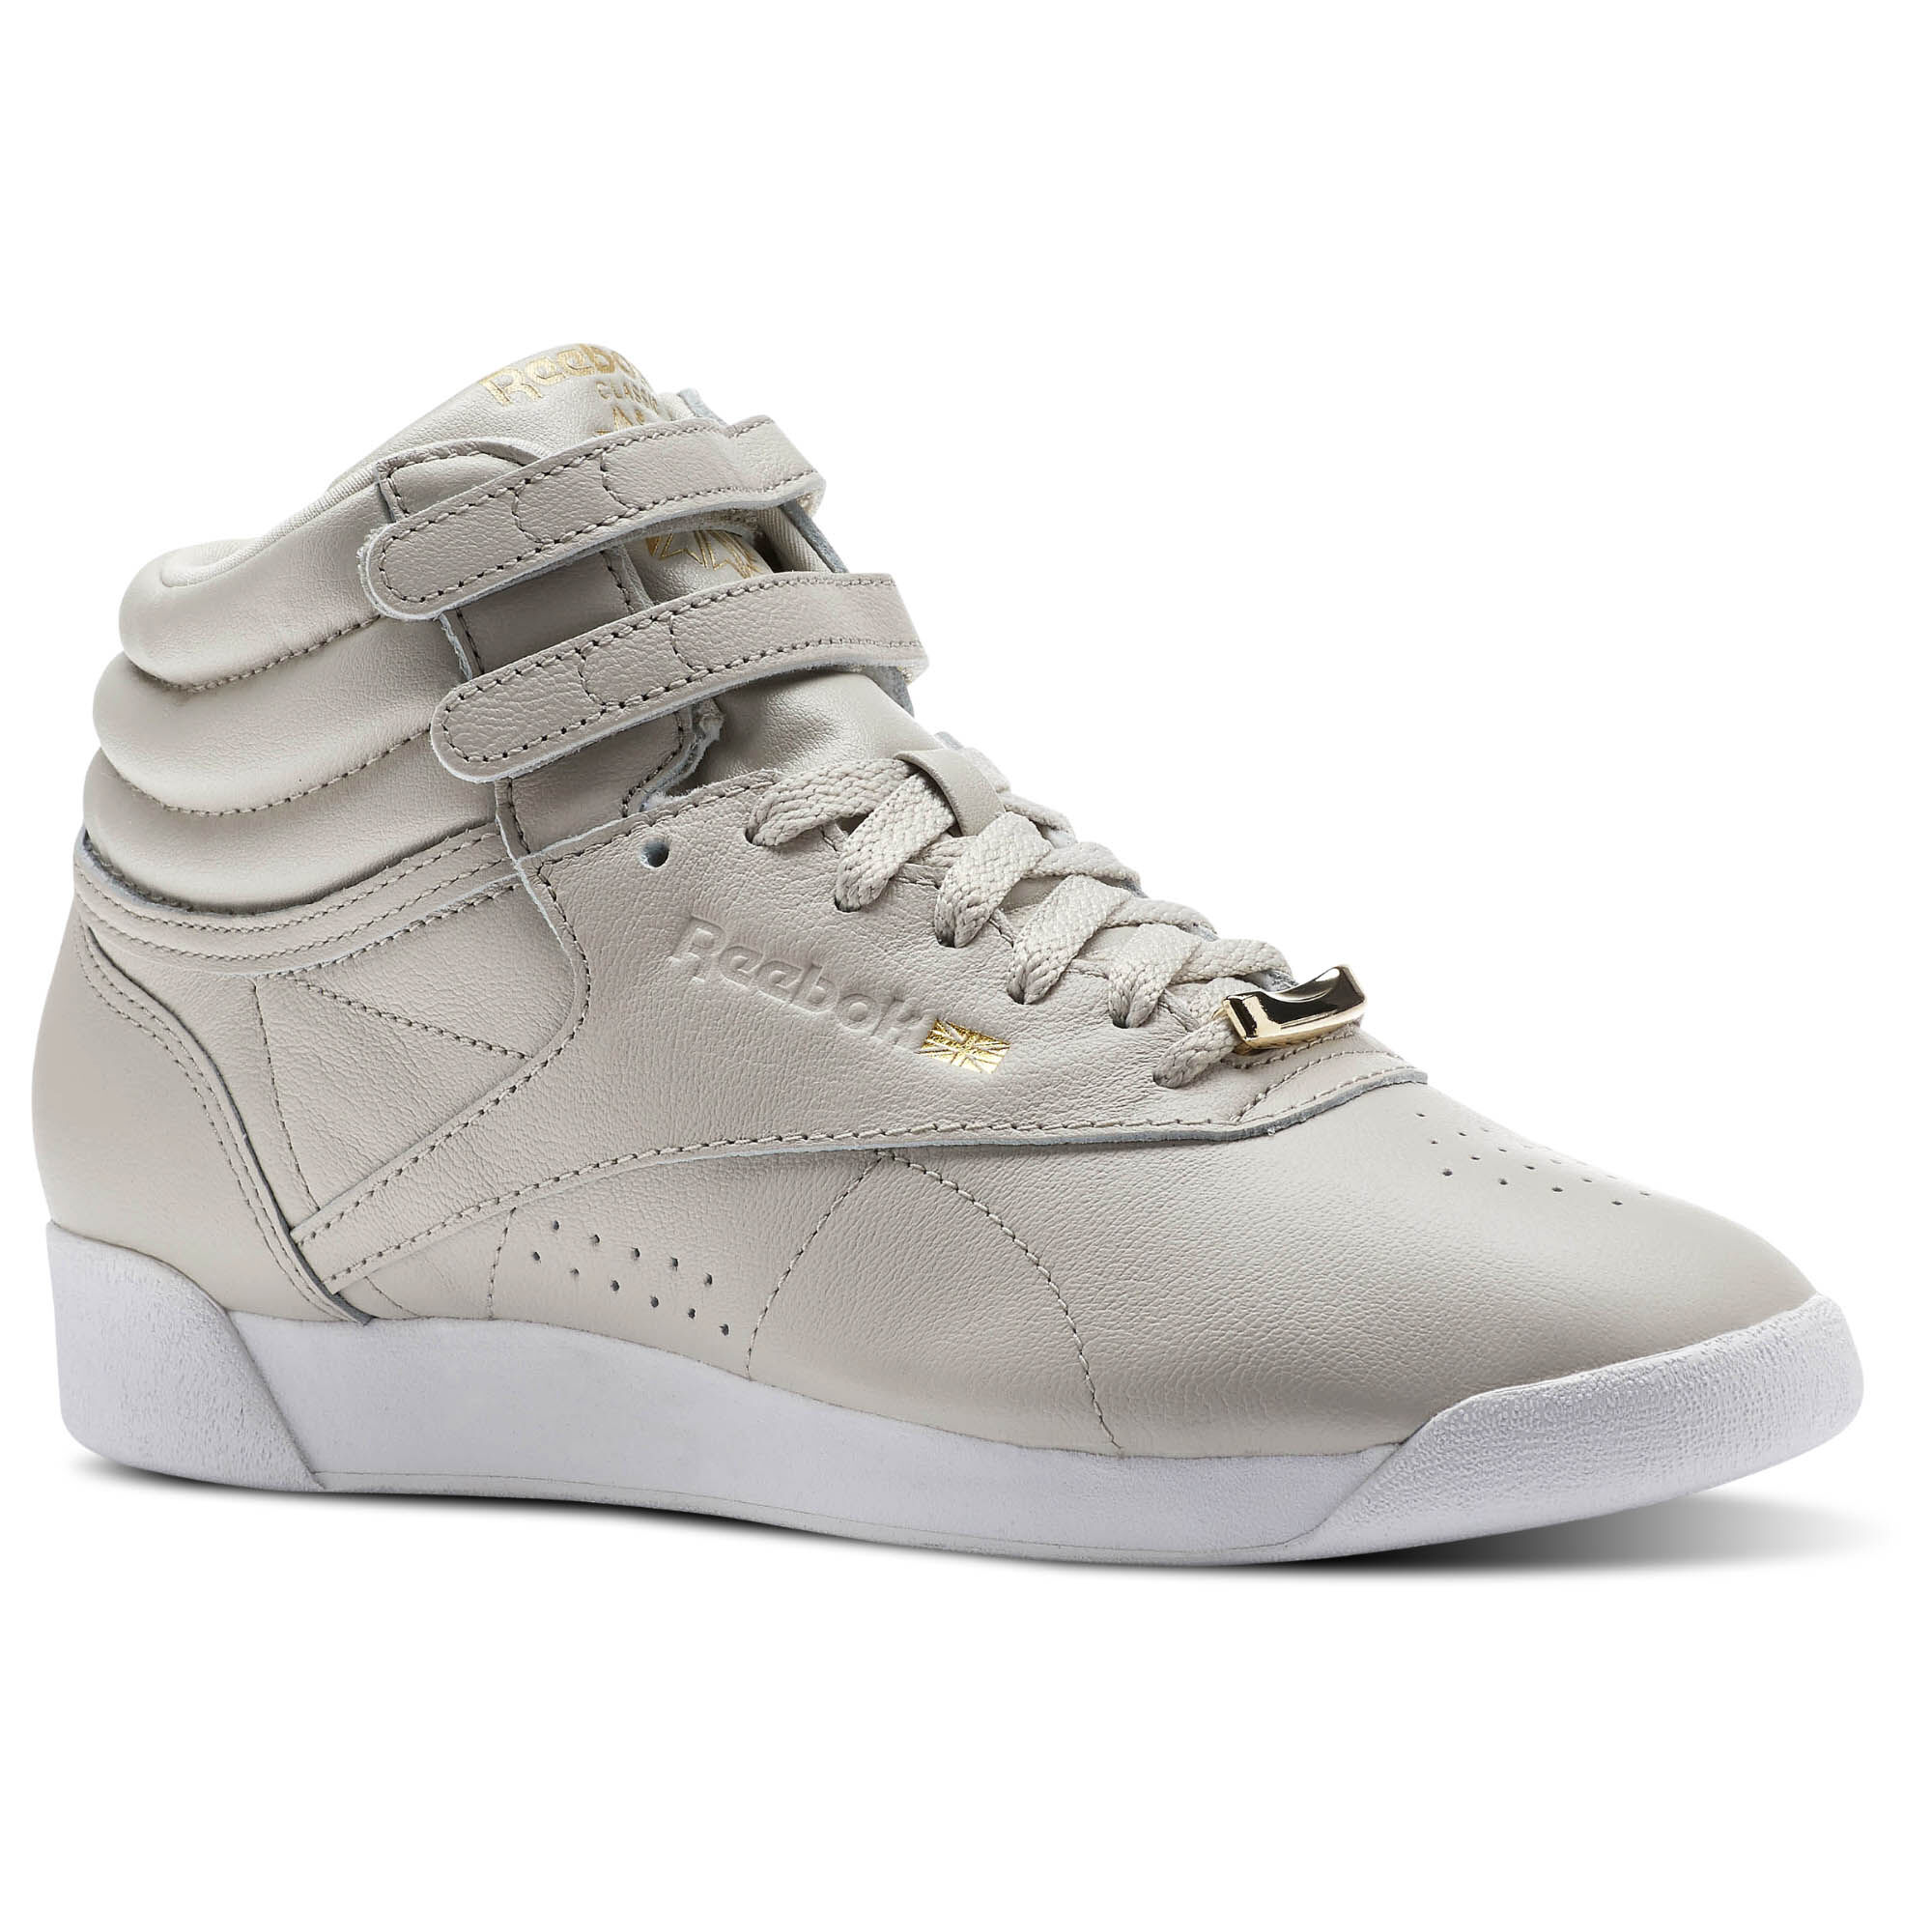 Reebok Workout Muted - Damen Schuhe Purple Größe 39 Z7Hl4Q2gMf